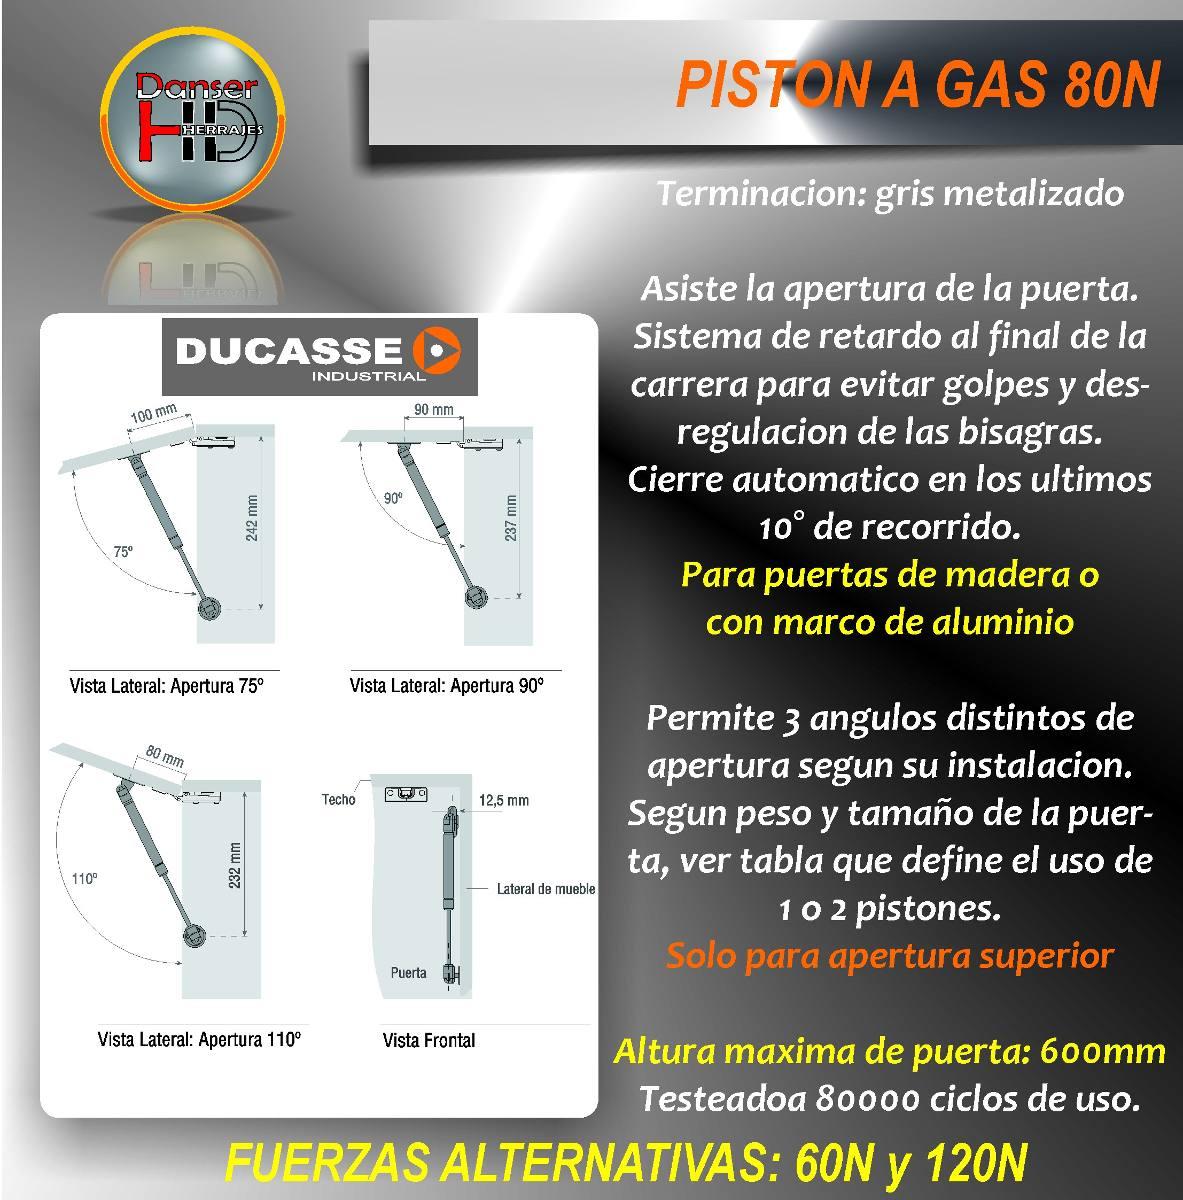 Piston A Gas 80 N Para Puerta Elevable, Herrajes Ducasse